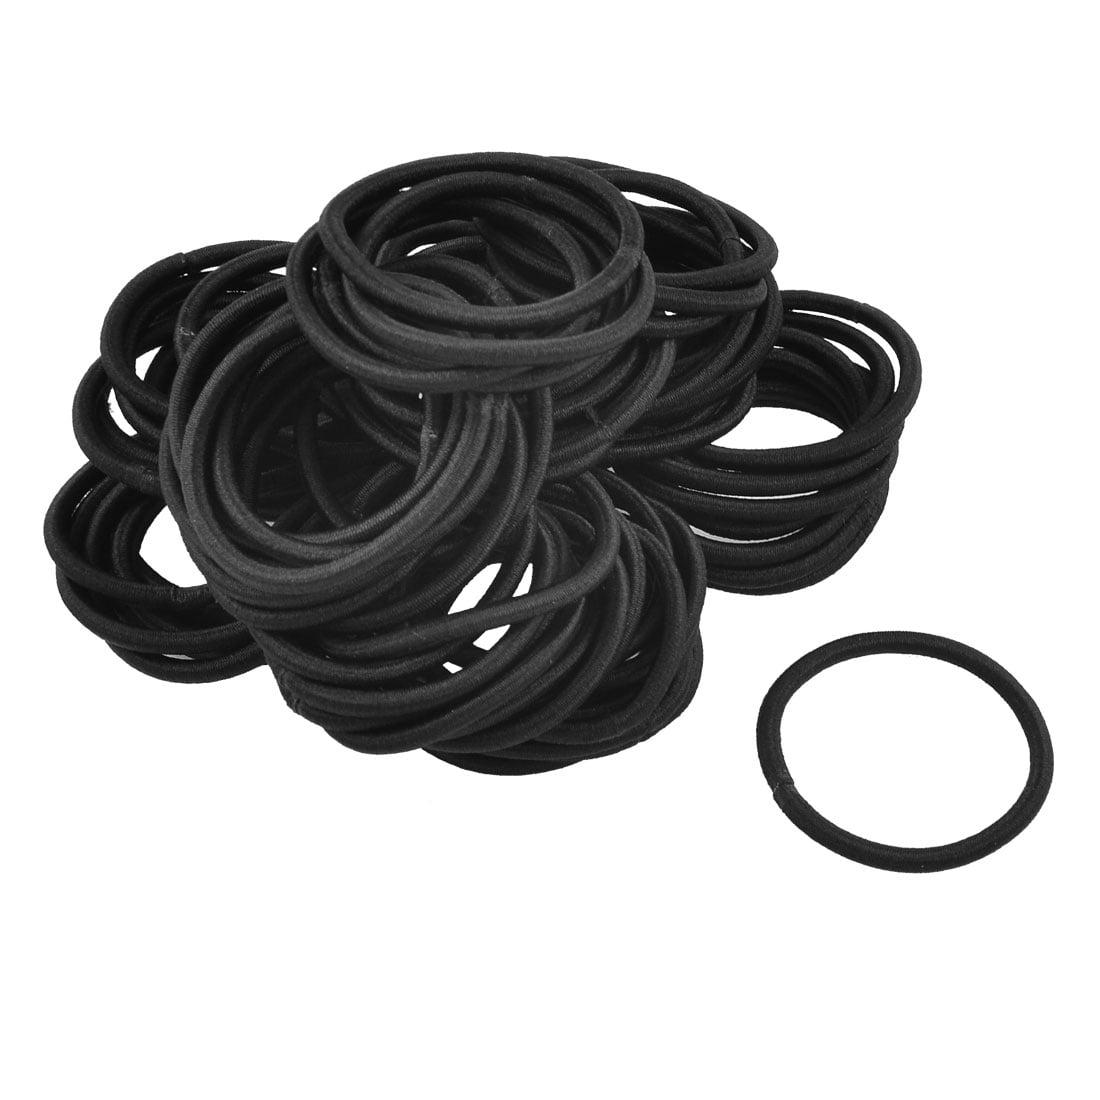 Unique Bargains - 80 Pcs Nylon Bobbles Stretchy Hair Ties Hair Bands  Ponytail Holders Black - Walmart.com 3e0e6347f2f